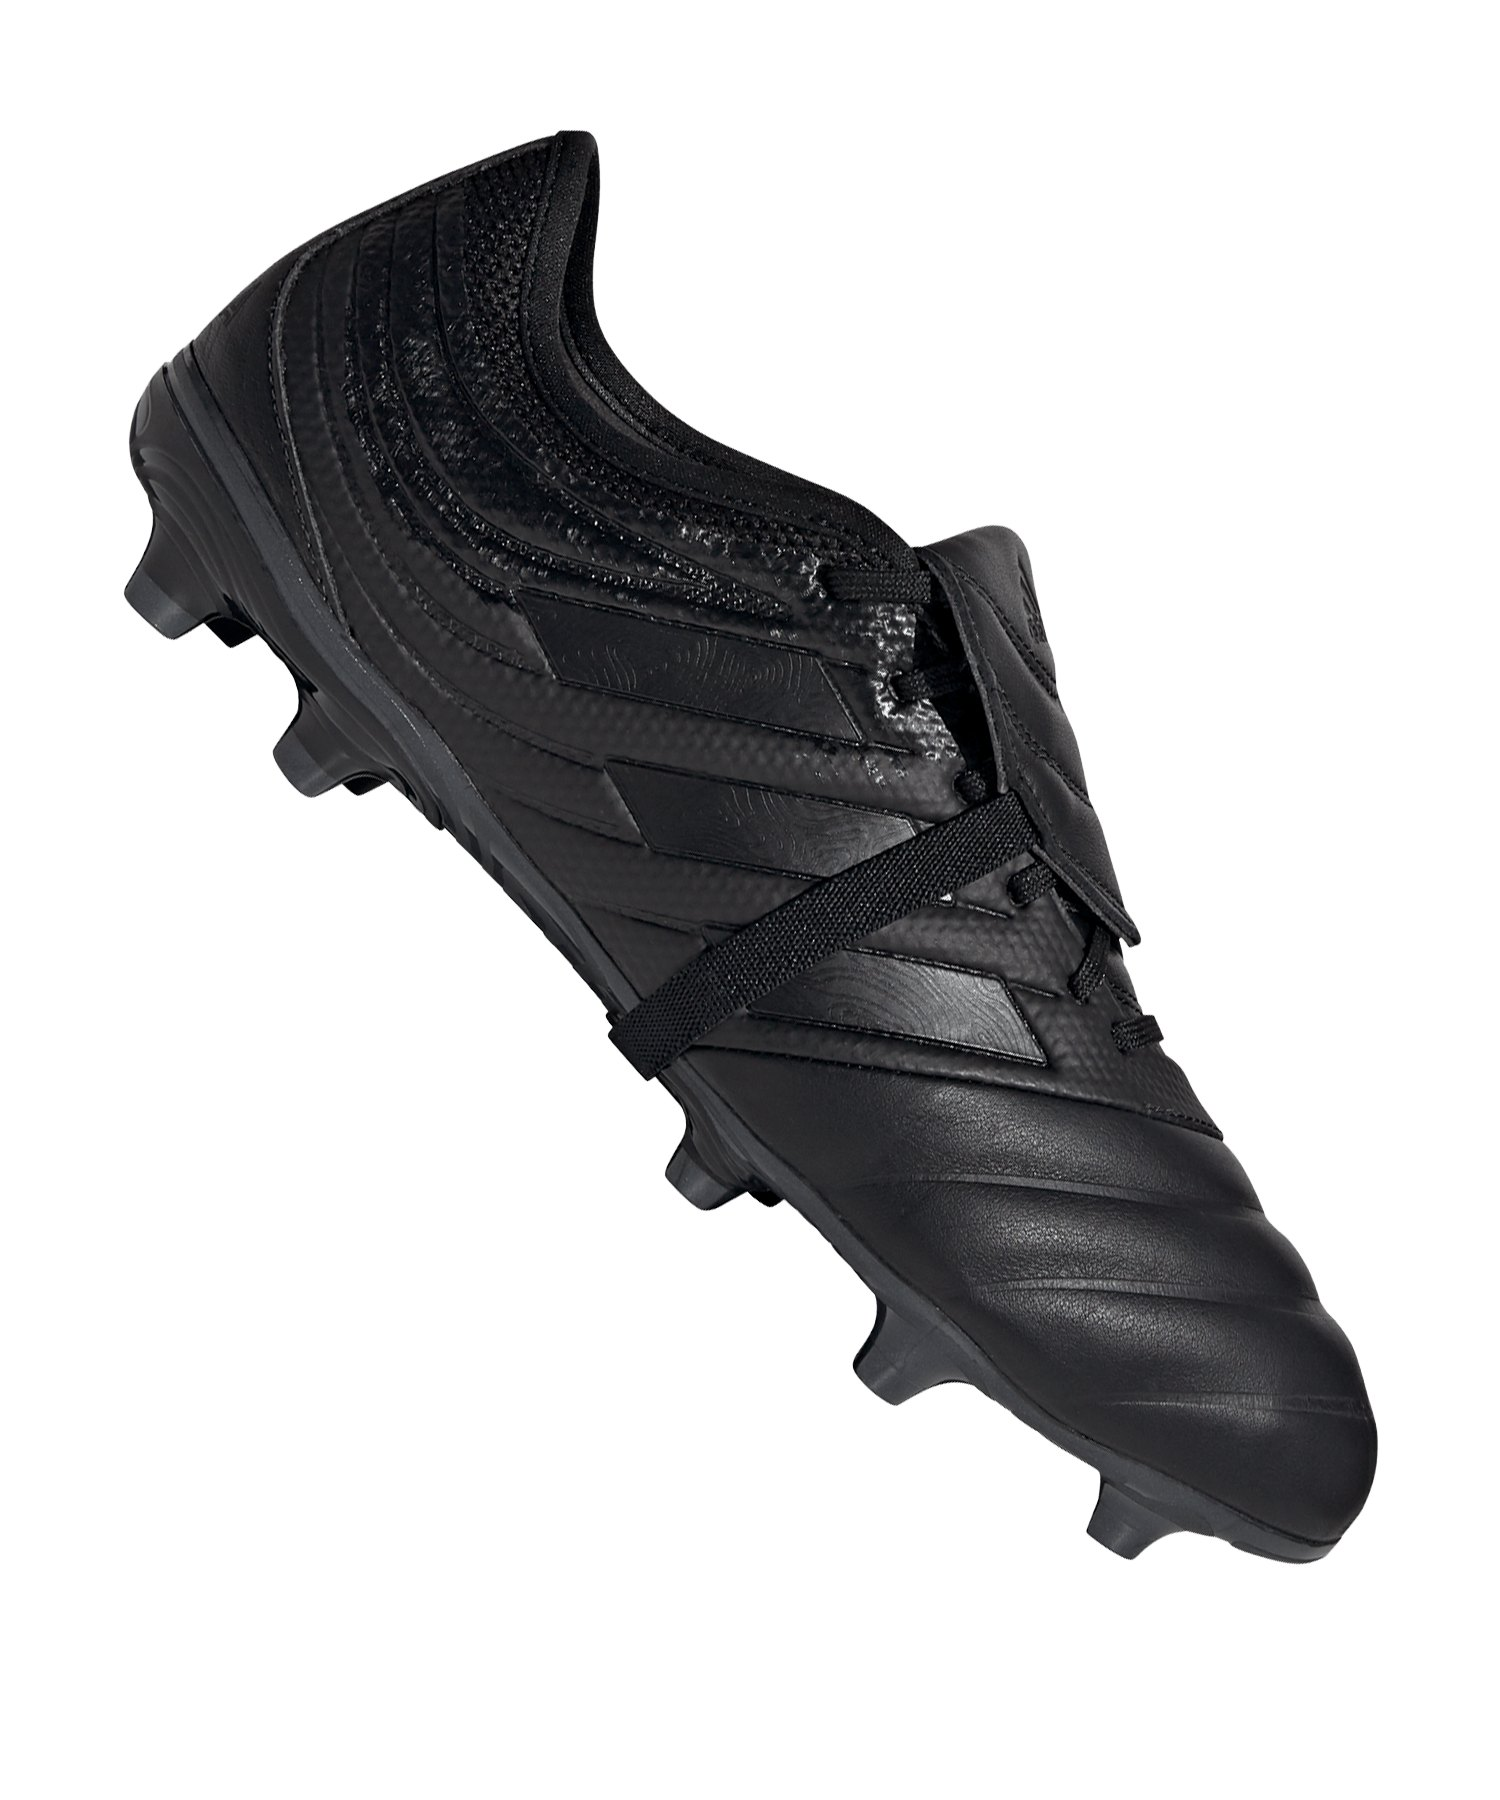 adidas COPA Gloro 20.2 FG Schwarz Grau - schwarz